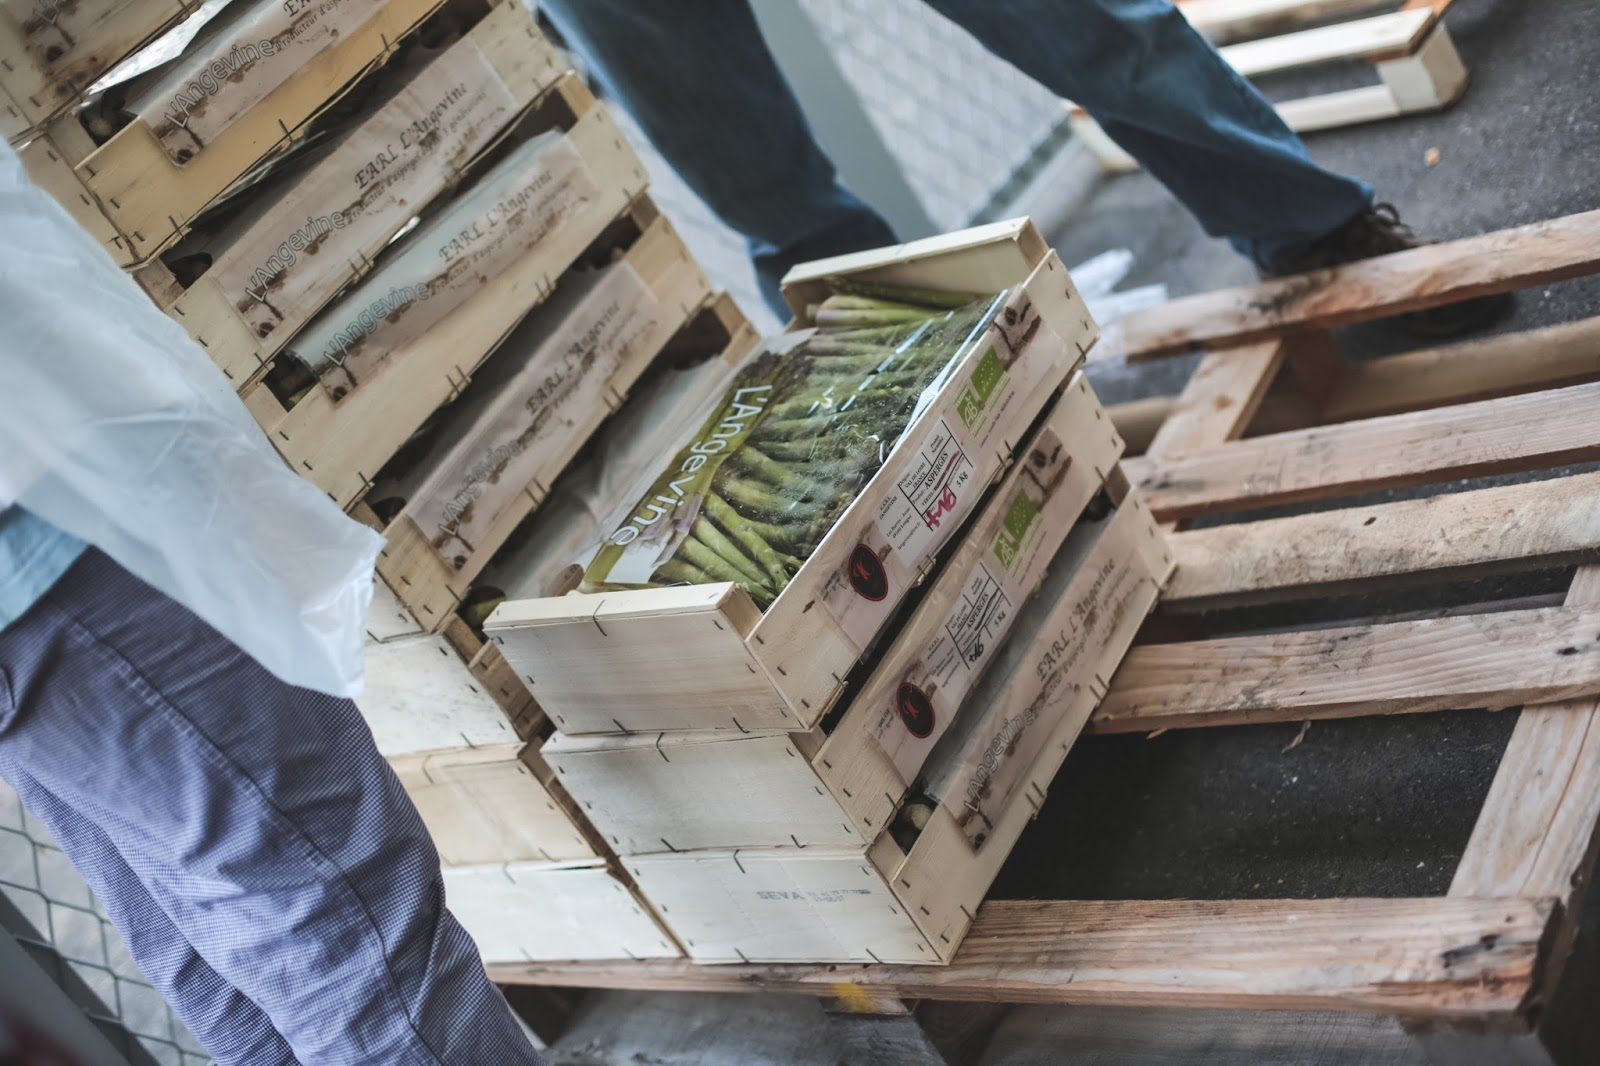 coulisse cuisine roland garros 2017 potel & chabot